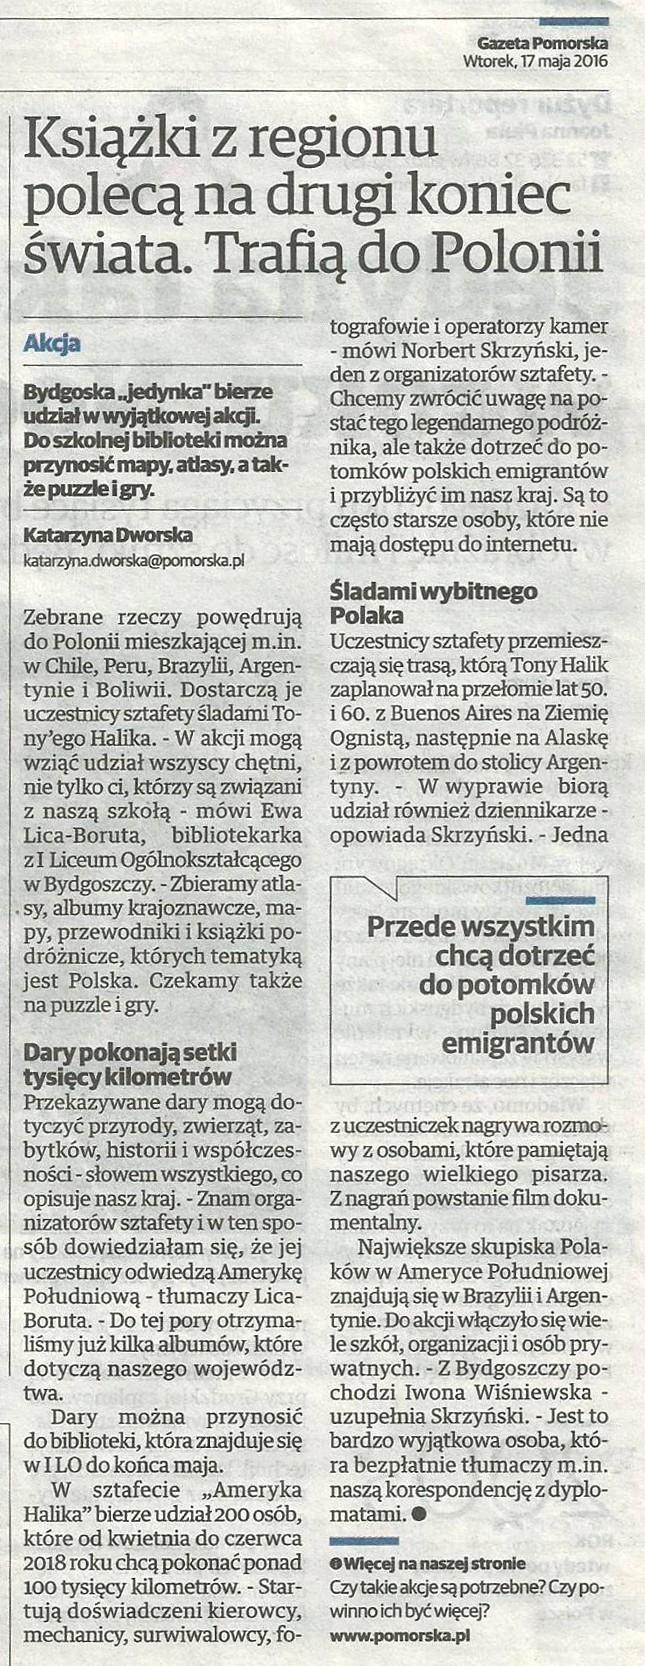 Gazeta Pomorska, 17 maja 2016 r.